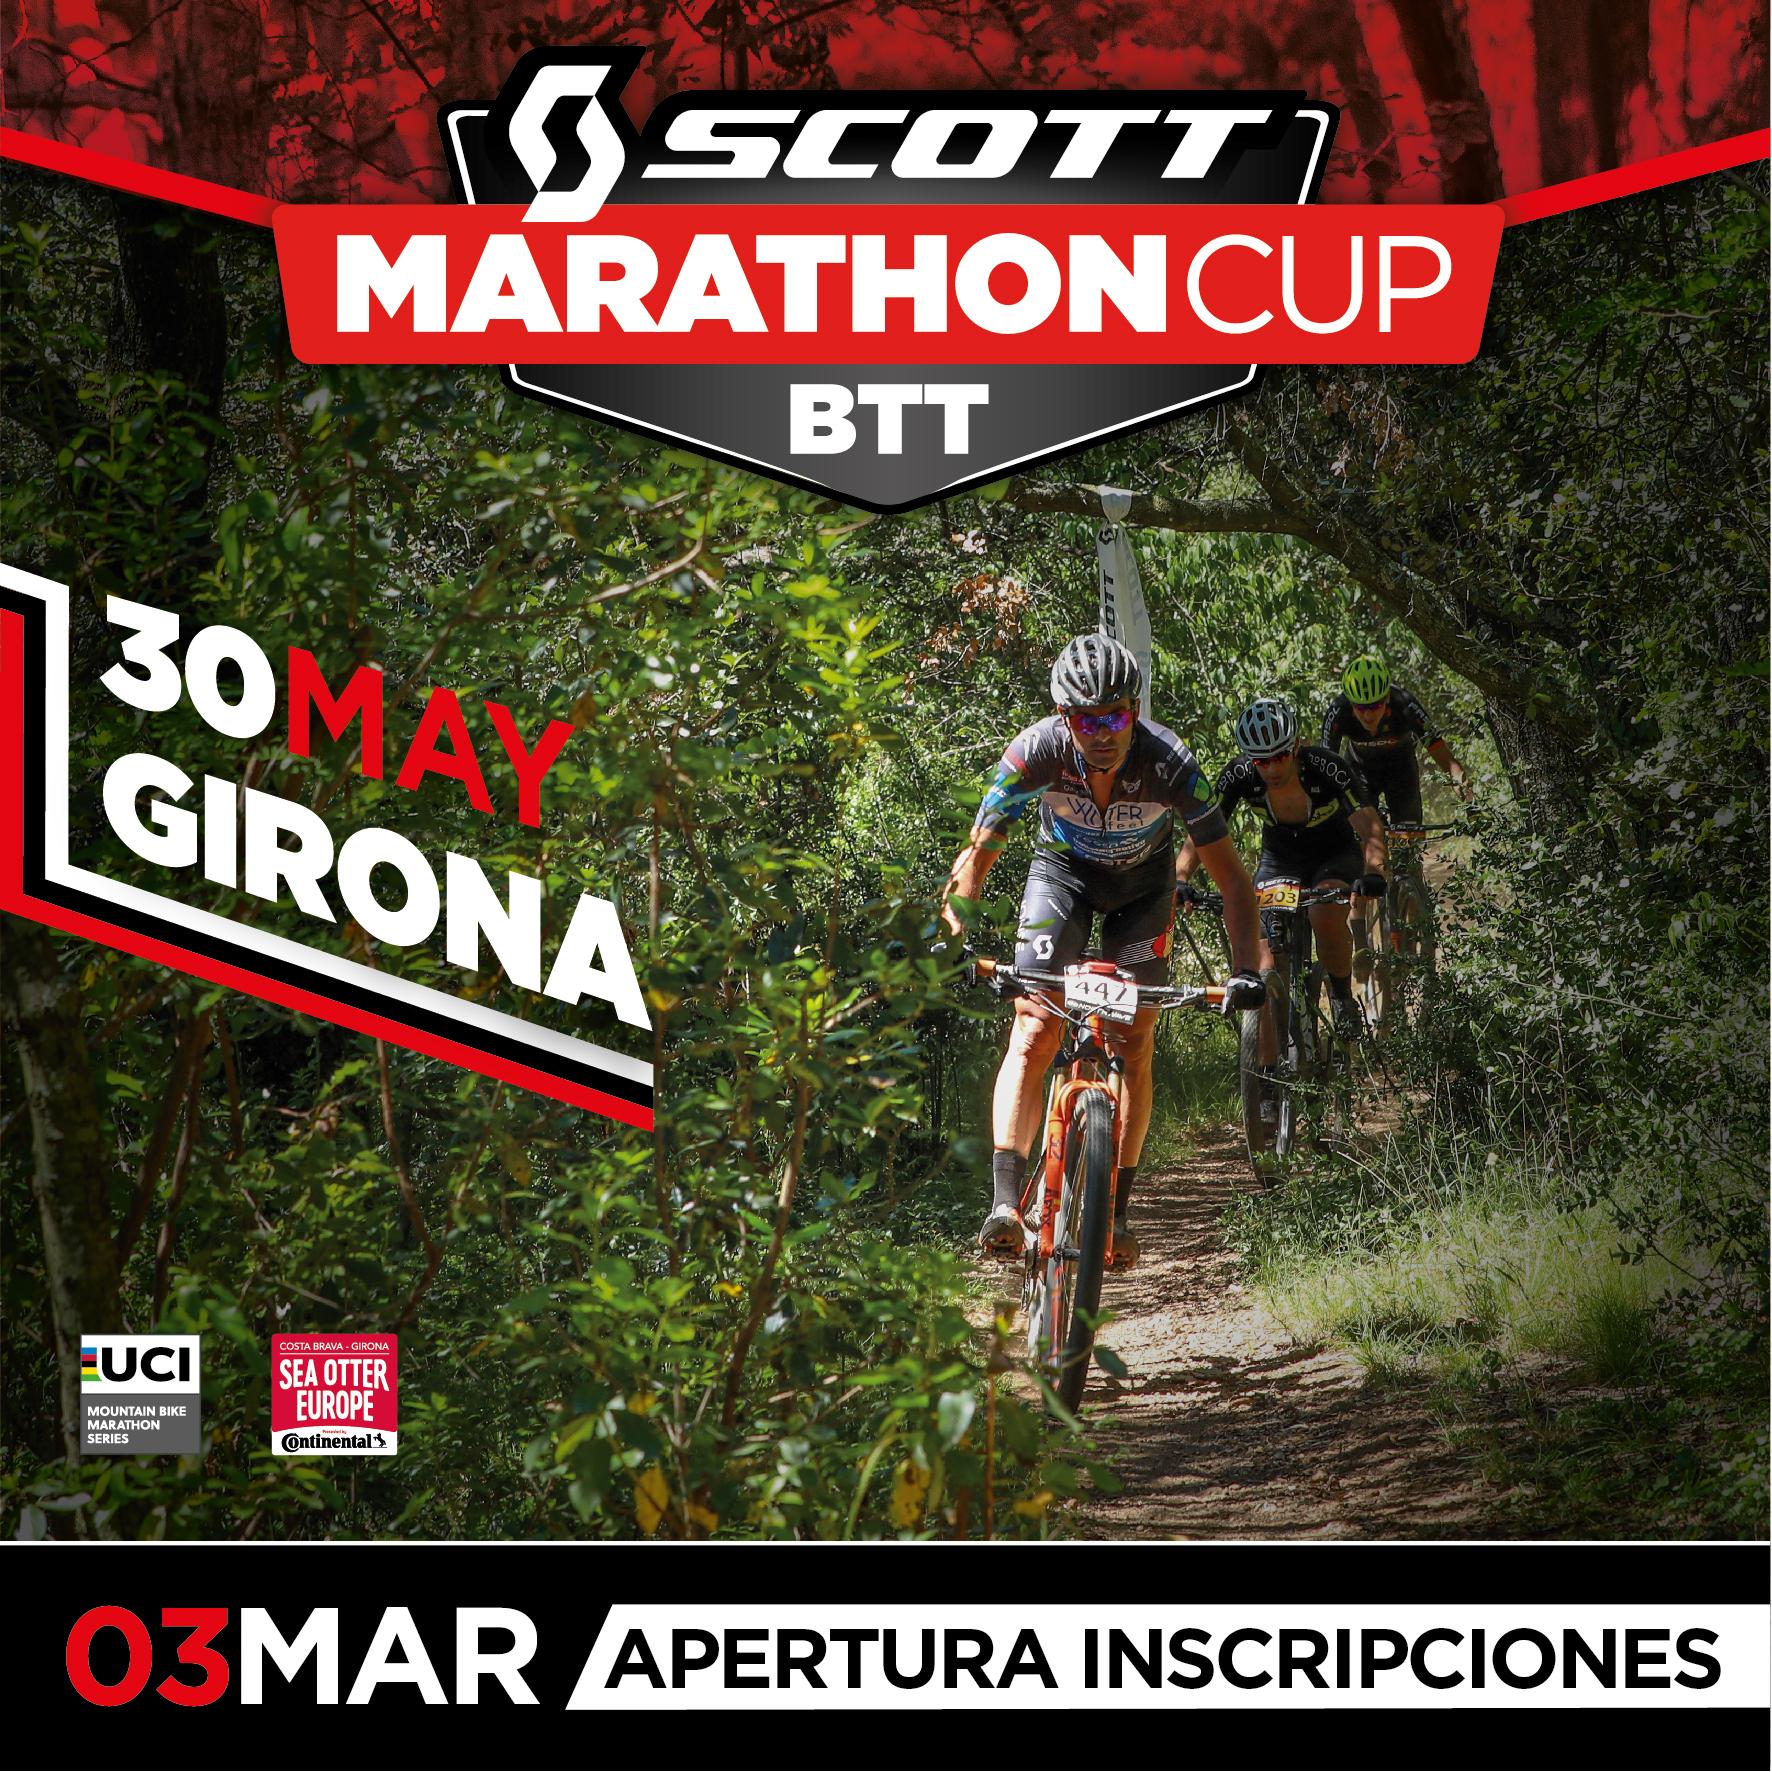 La Scott Marathon Cup de Girona abre inscripciones el 3 de marzo